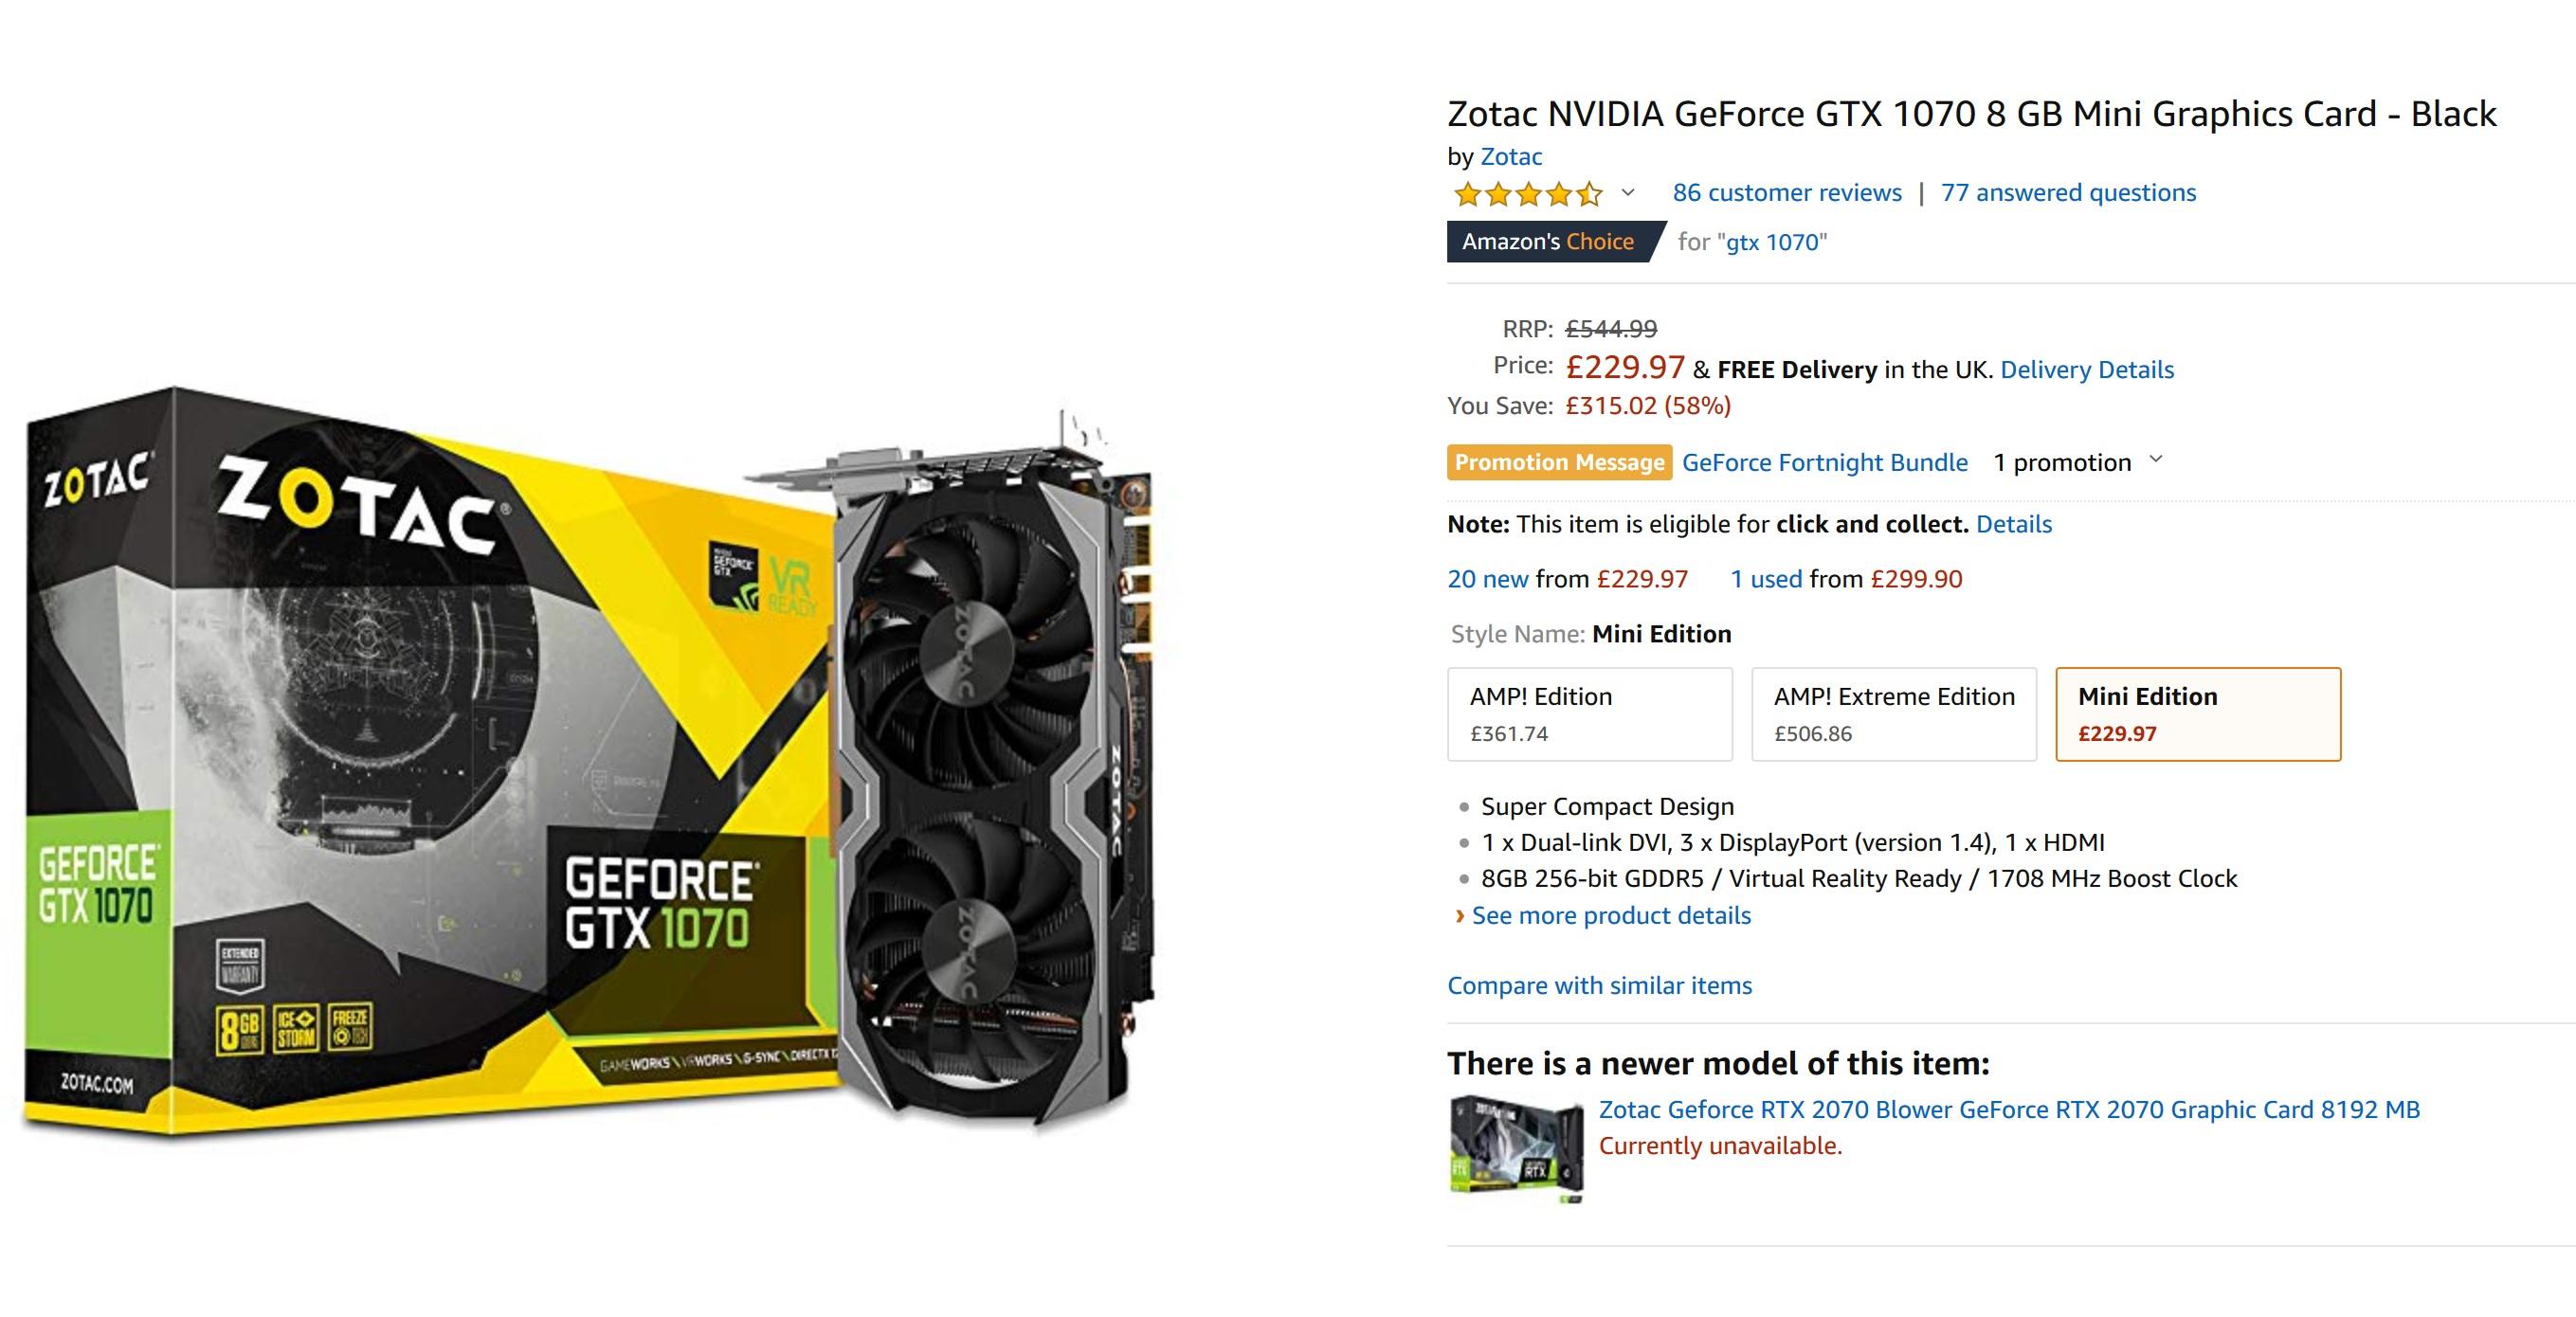 Zotac NVIDIA GeForce GTX 1070 8 GB Mini Graphics Card - Black in amazon.co.uk